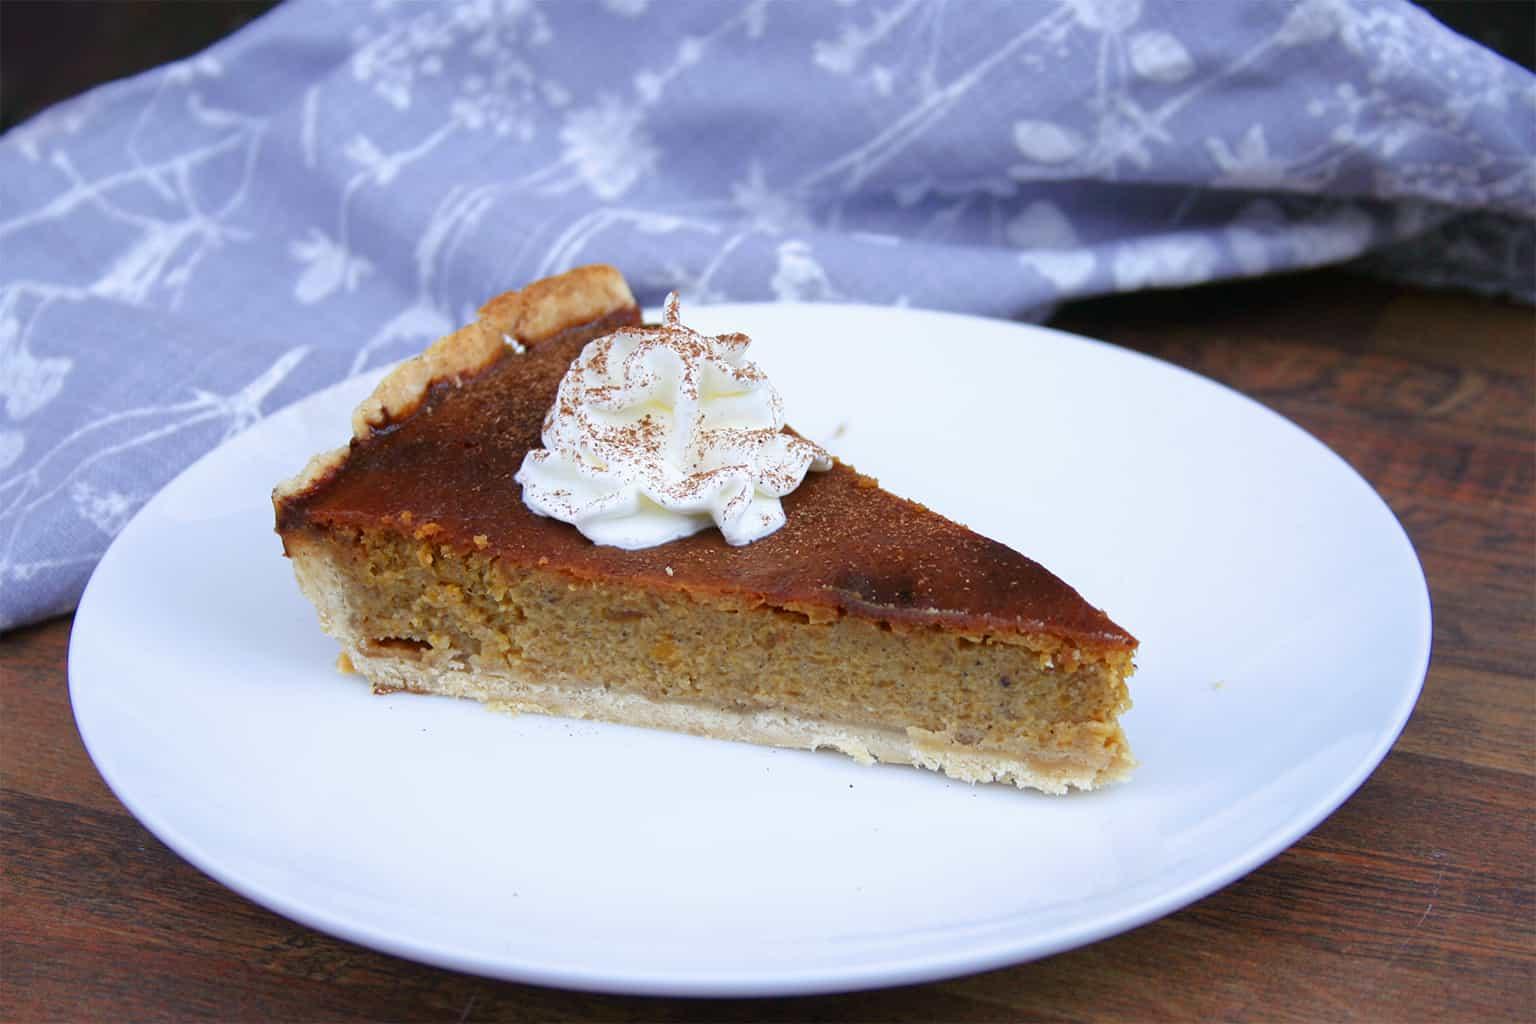 Pumpkin pie slice on plate